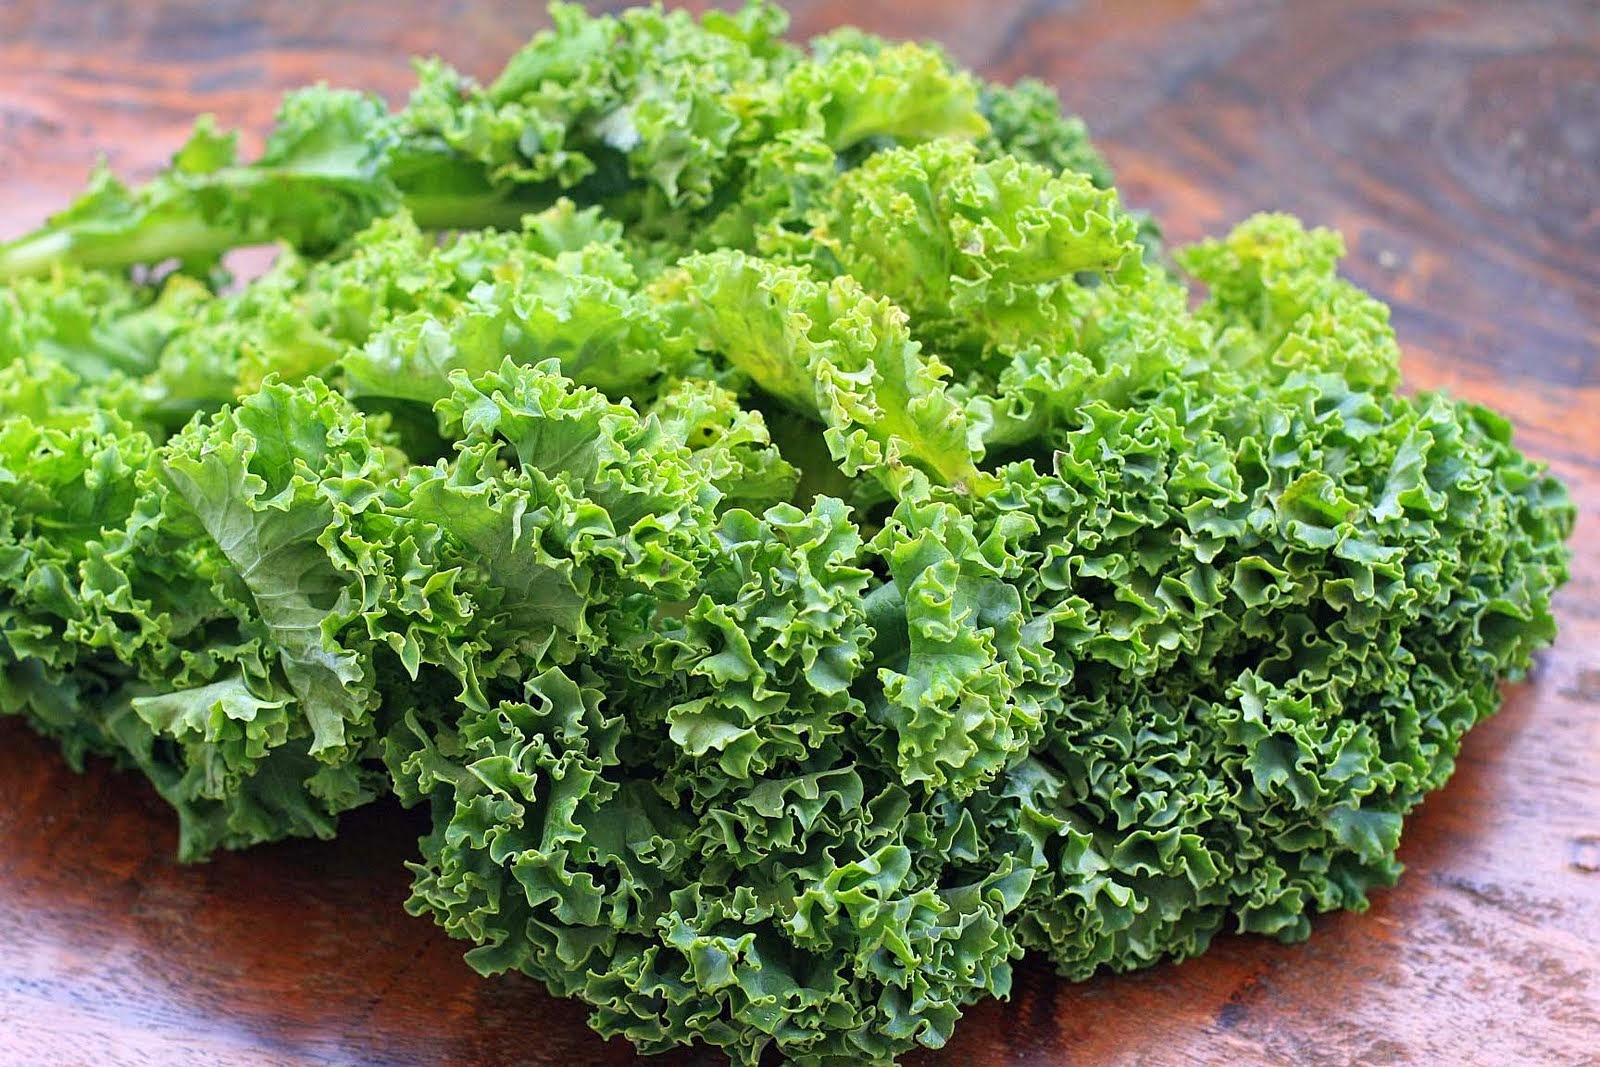 Vegetables like kale